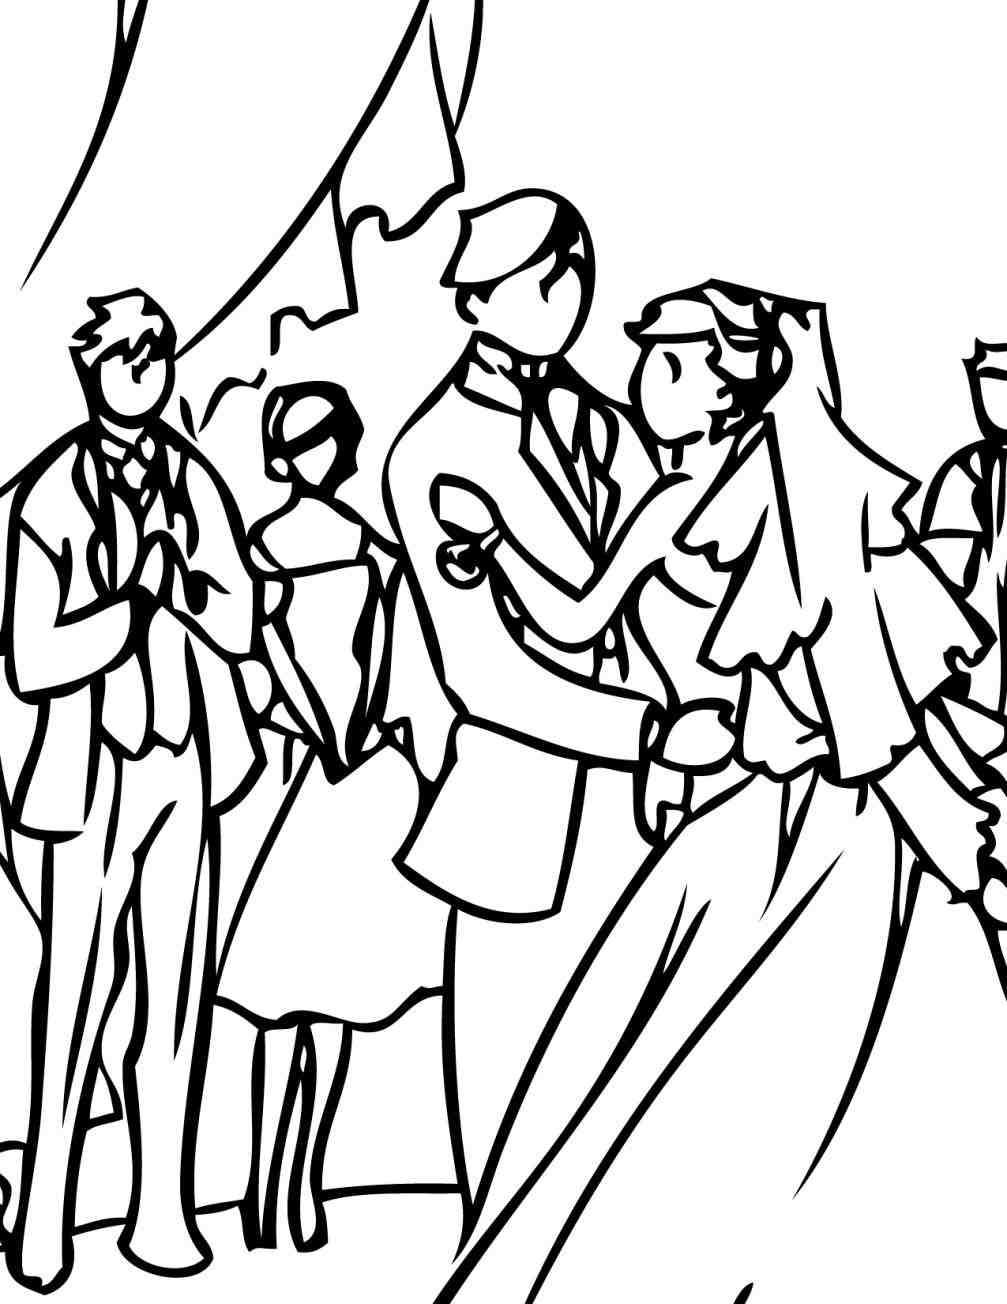 1007x1304 Bride Wedding Reception Dancing Clipart S Free Download Clip Art